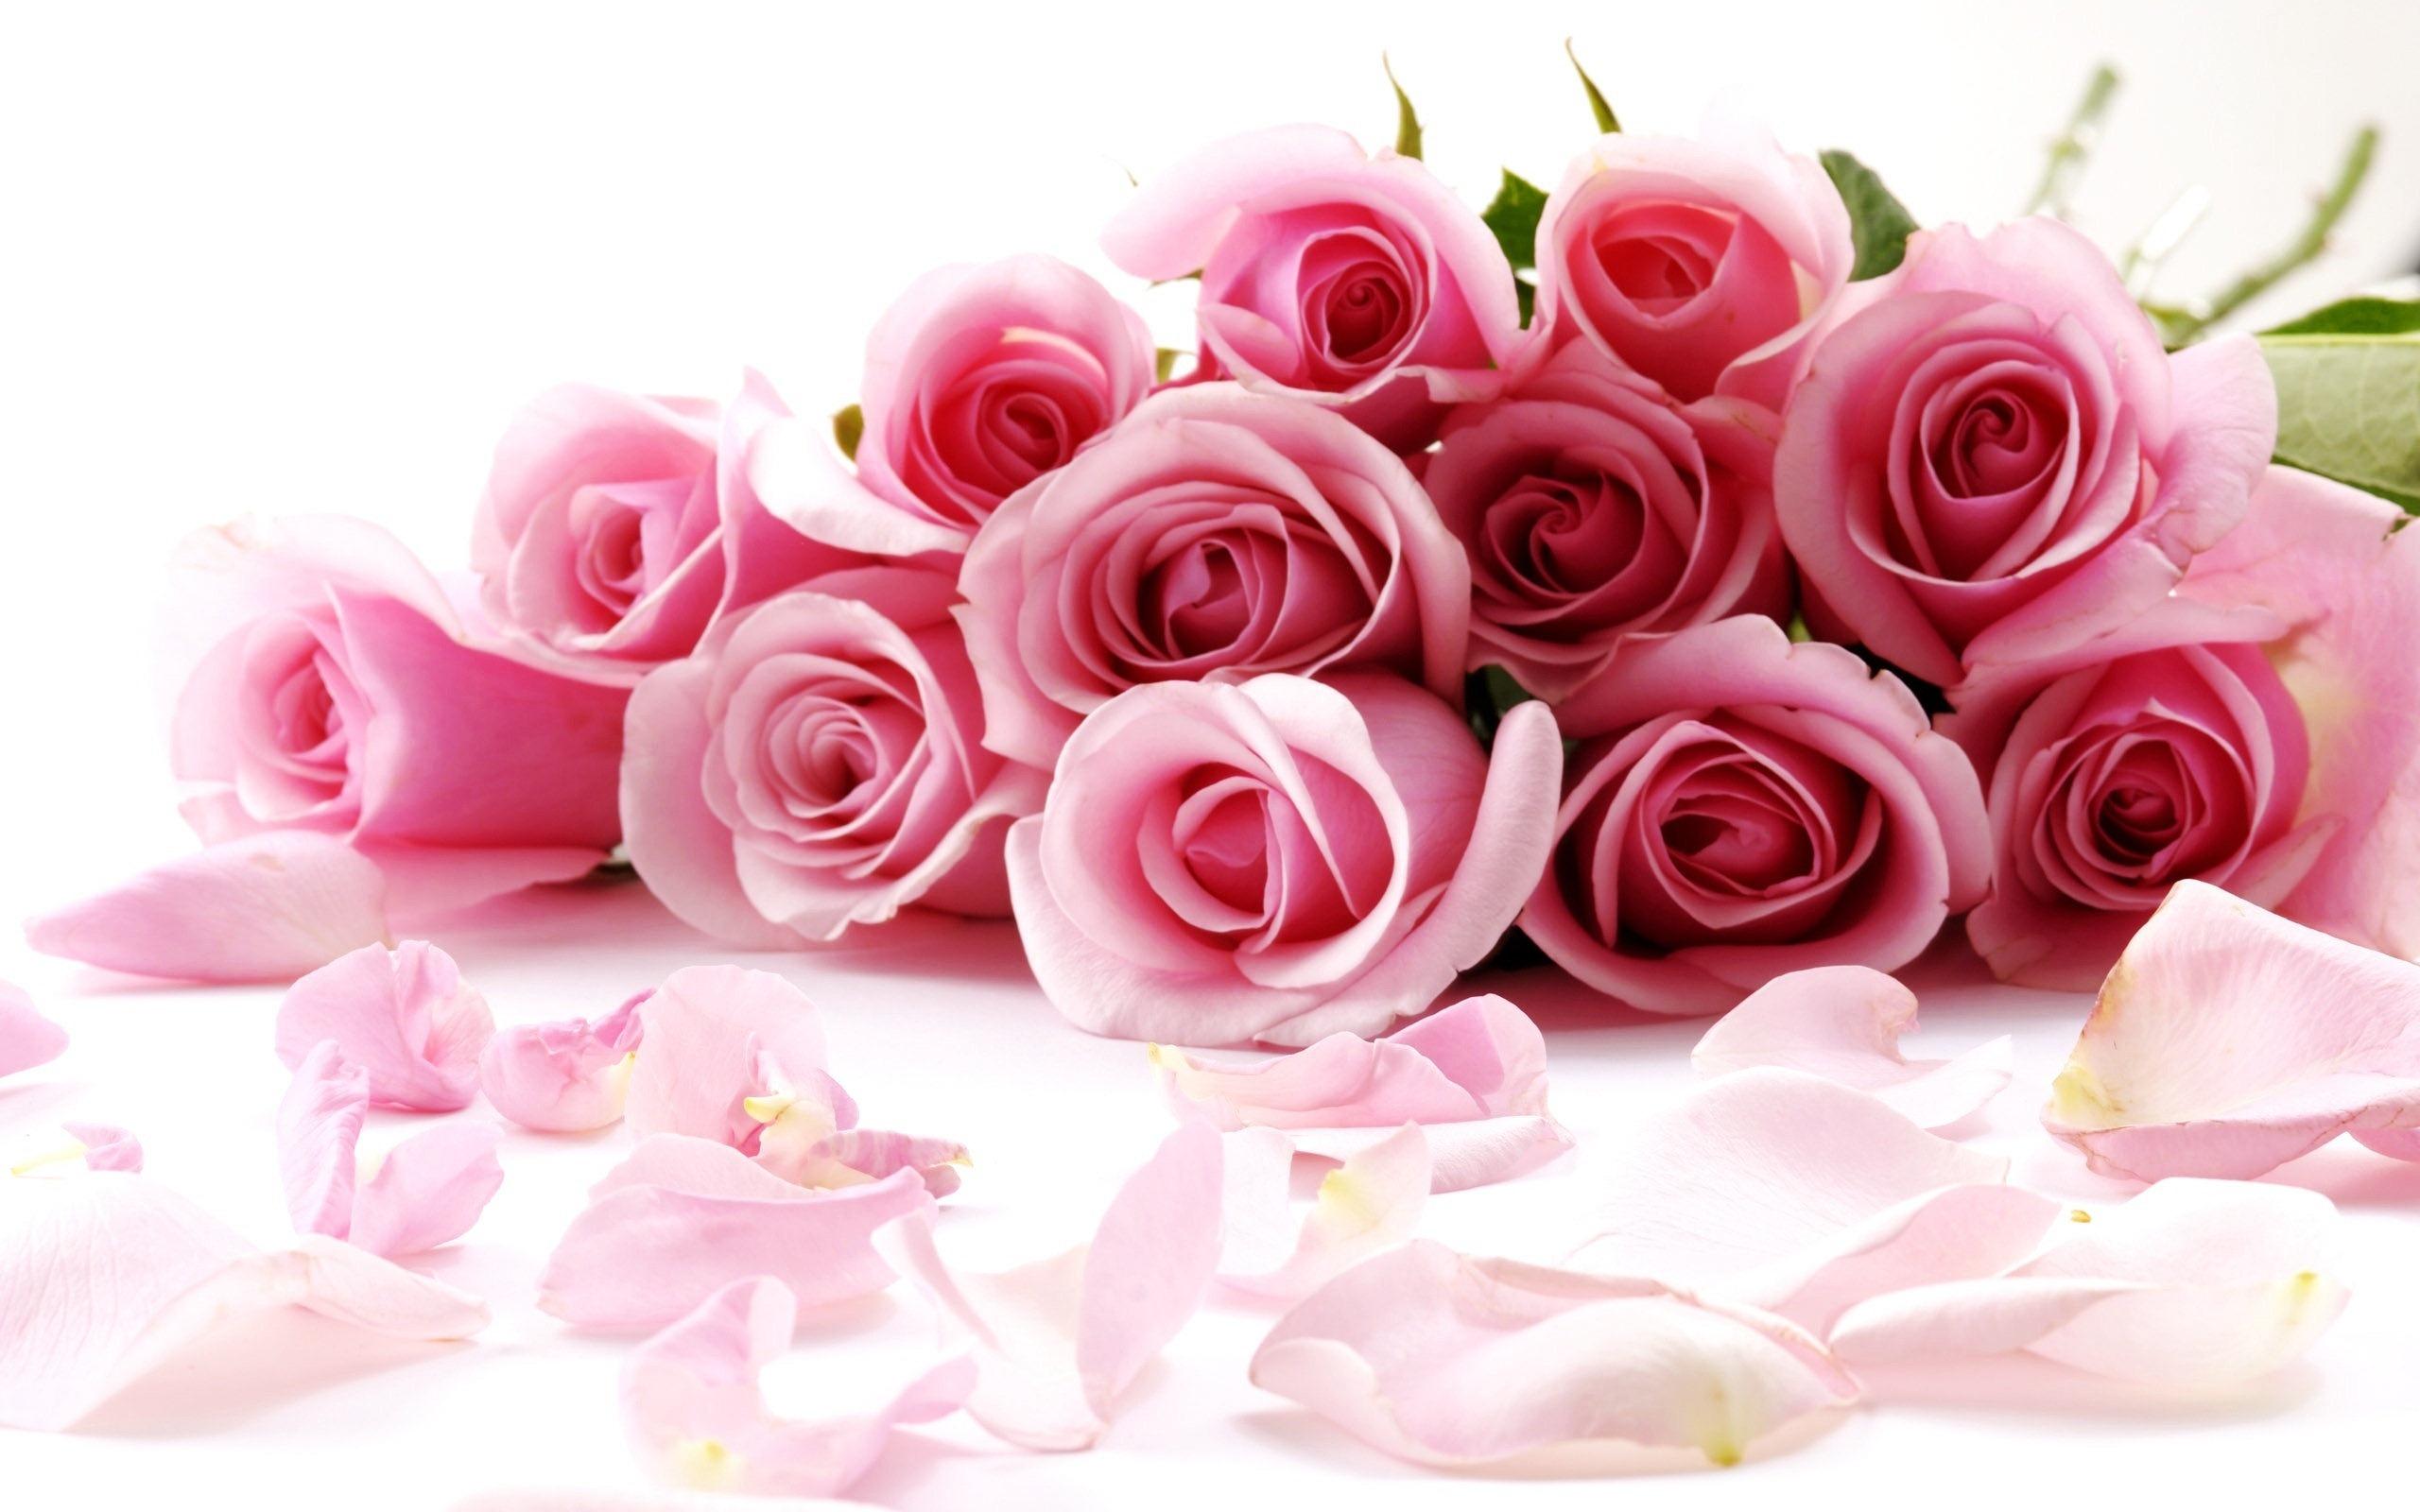 Saturday February 14th Happy Valentine S Day Vernard Alsberry Jr